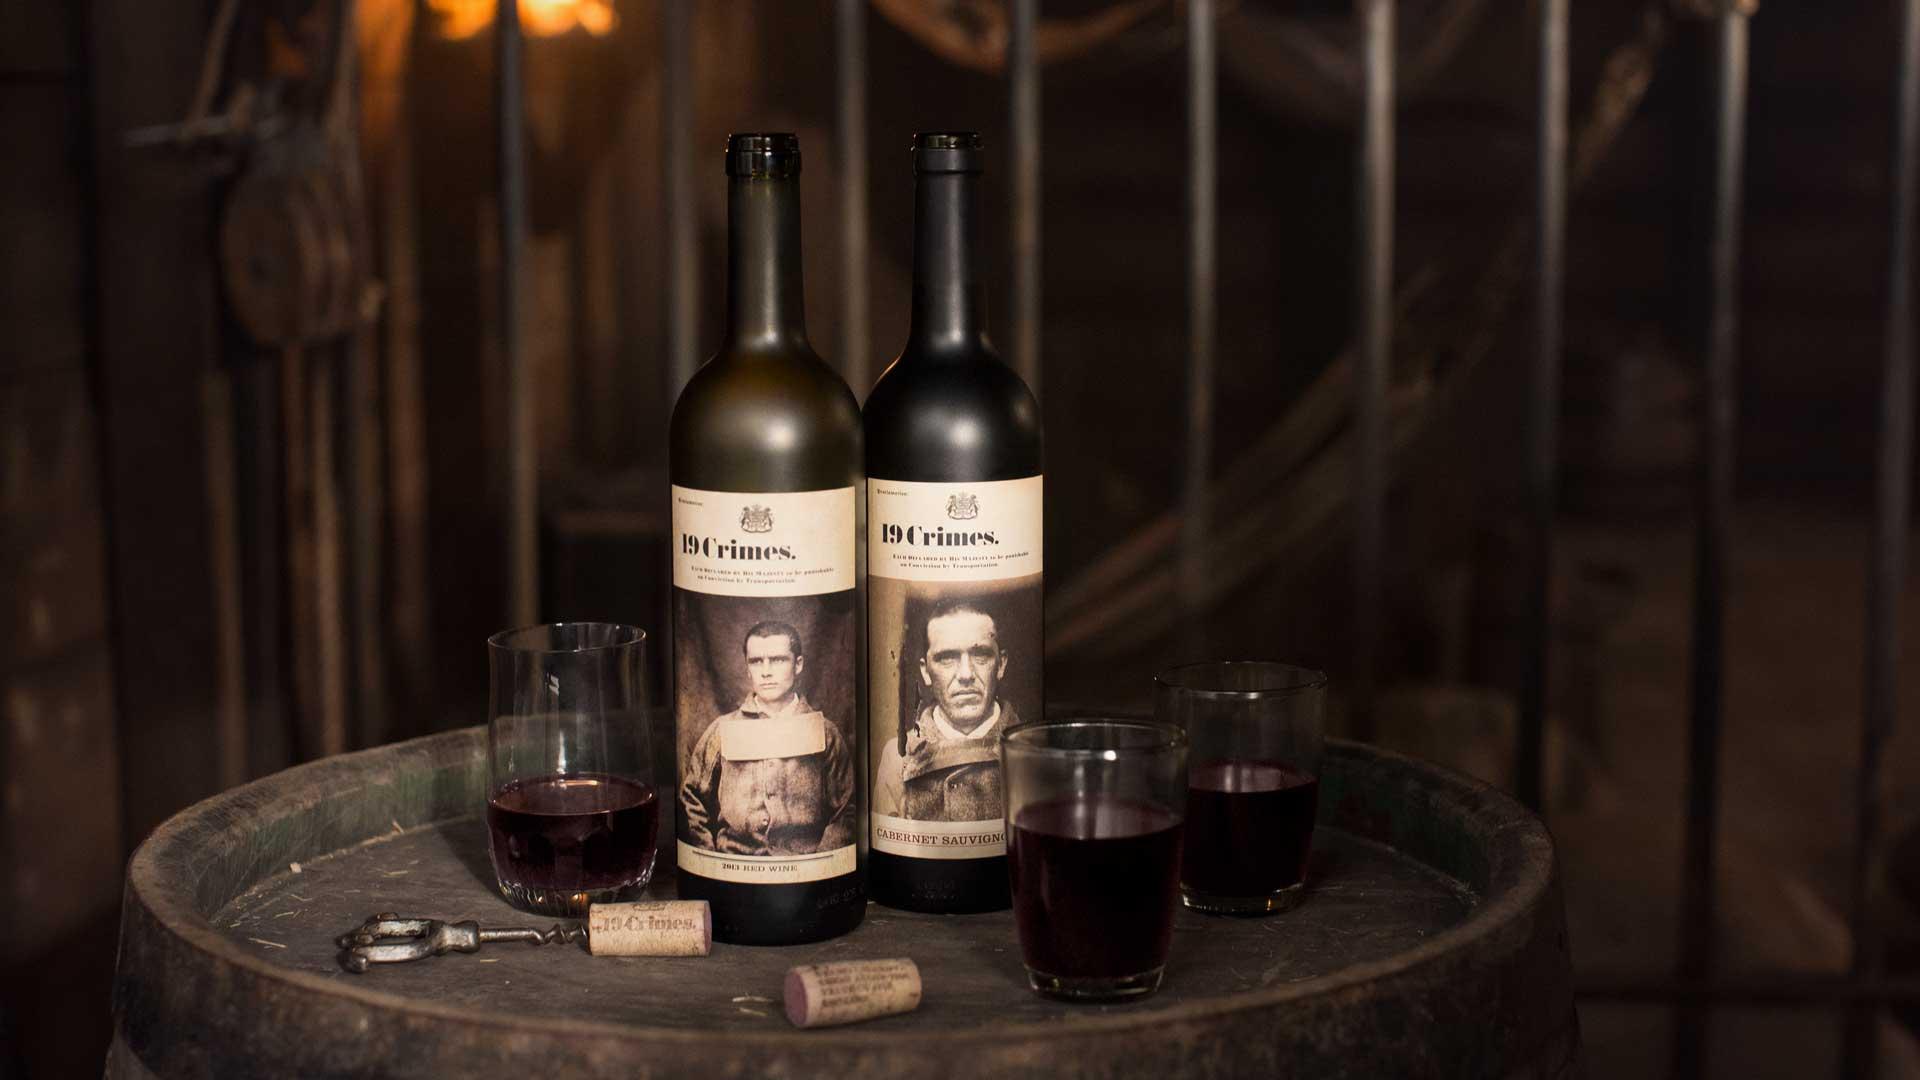 19 Crimes, un vino con sabor a delito